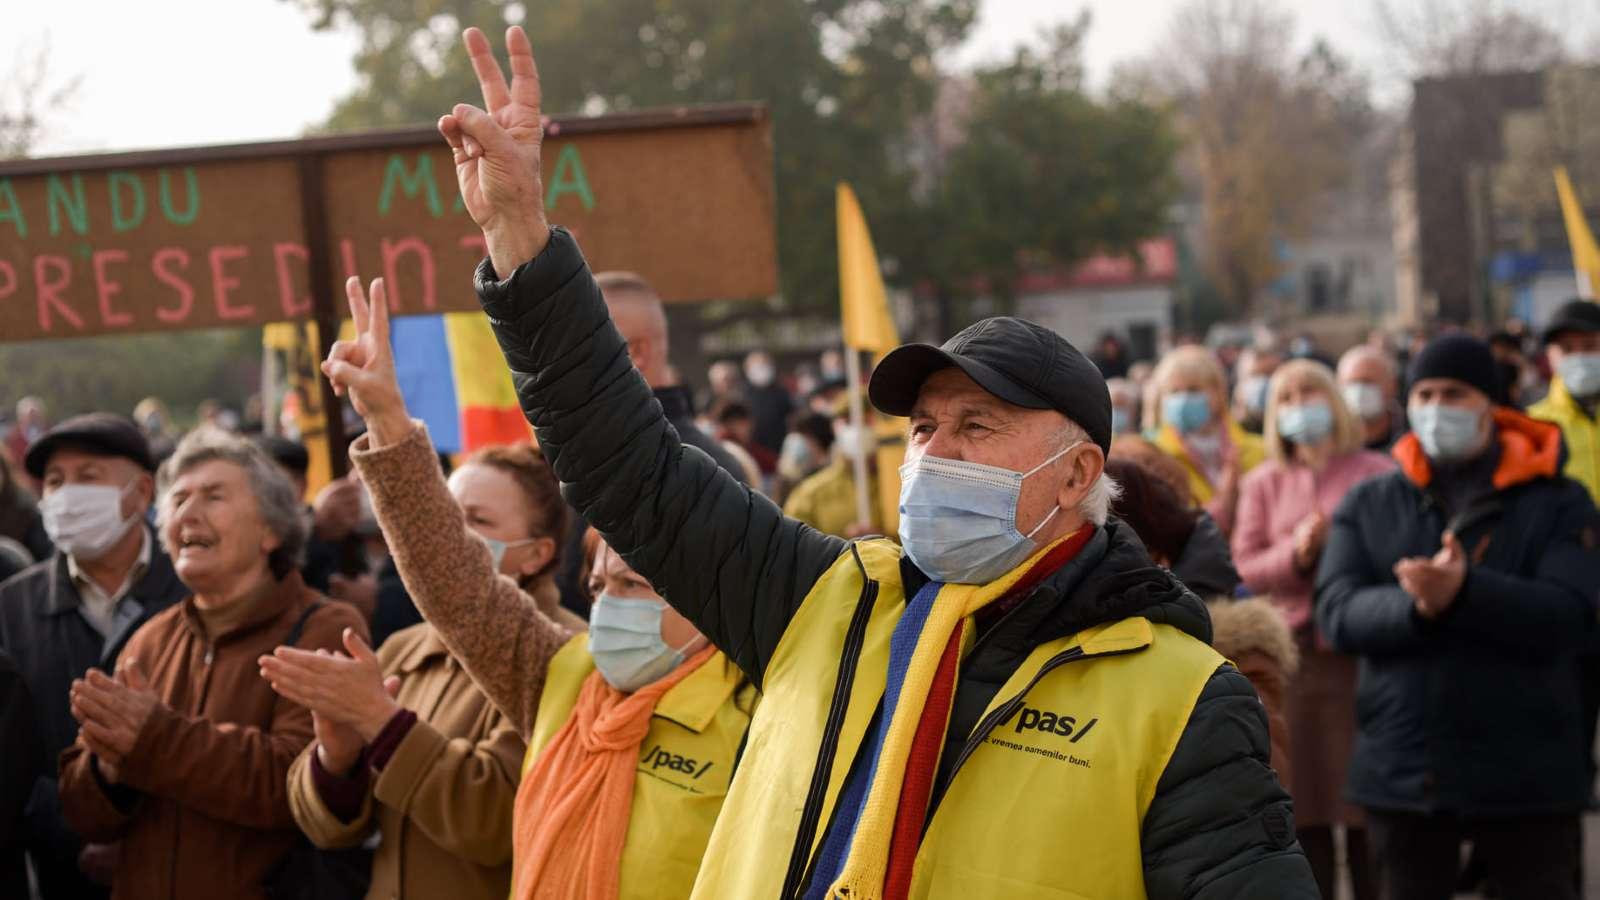 Photo: Supports of Maia Sandu at a rally in Straseni, Moldova. Credit: Maia Sandu Facebook